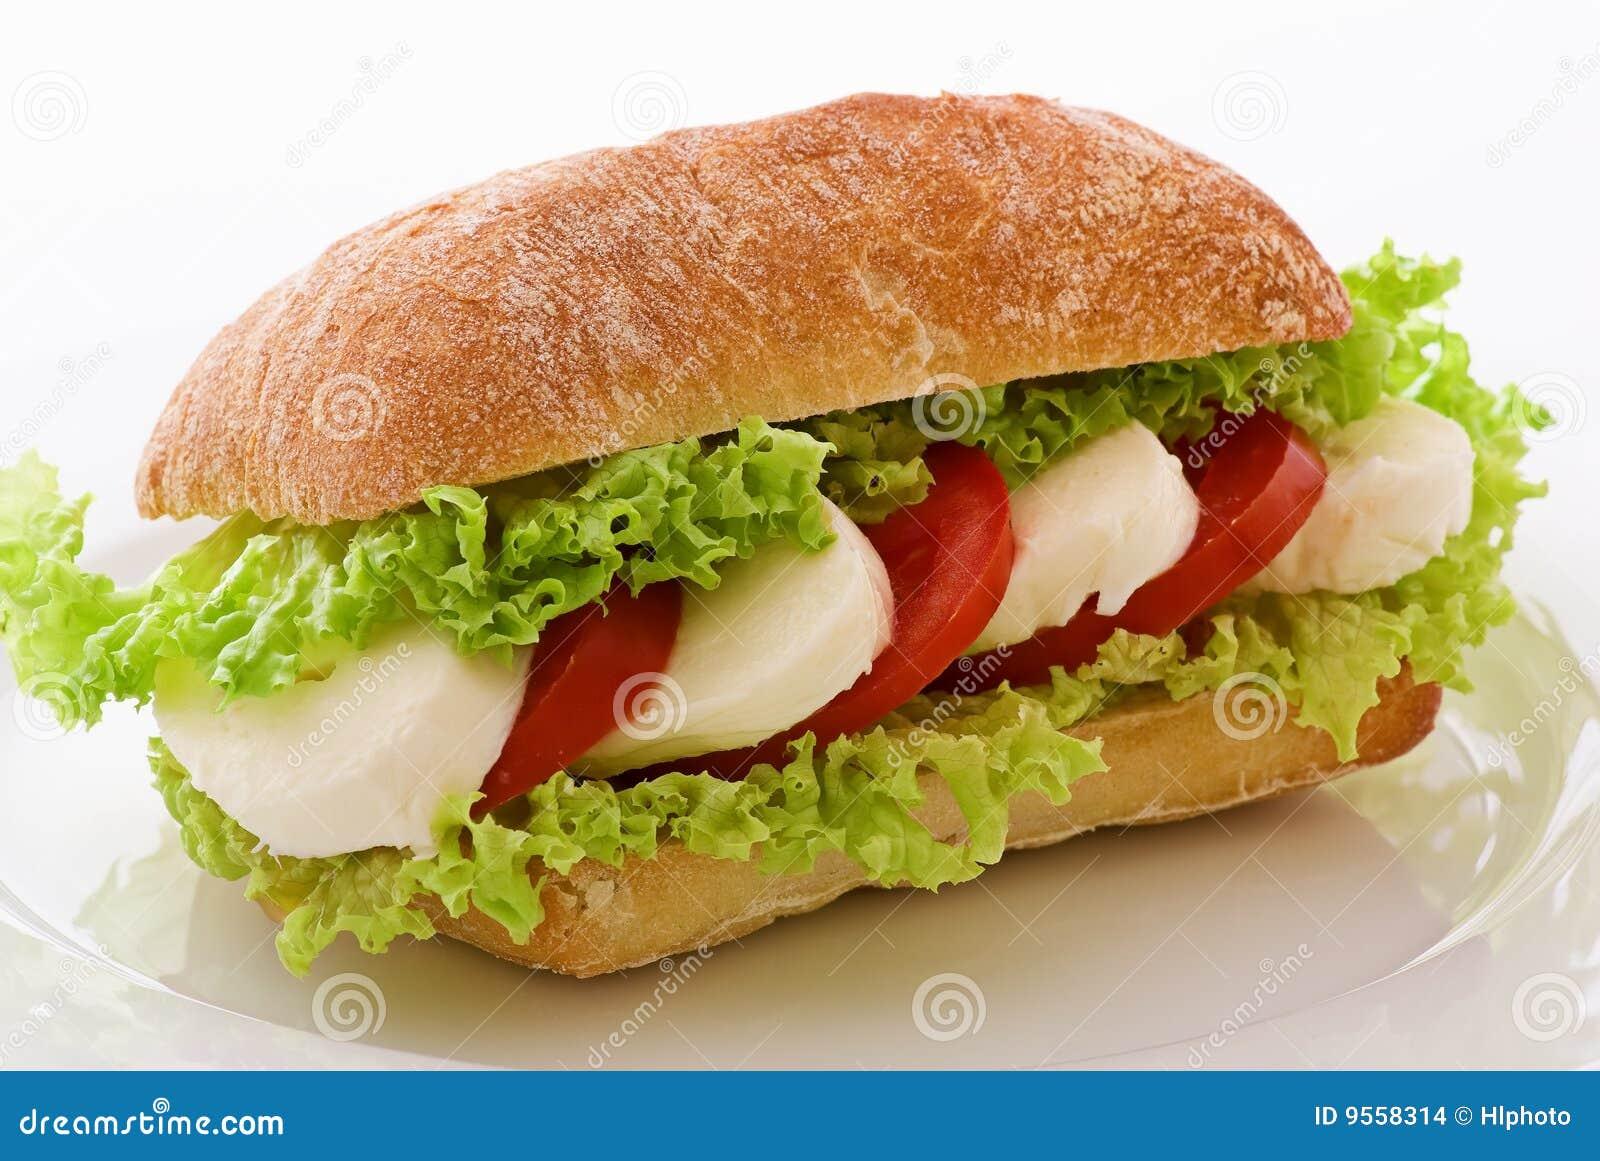 sandwich with tomato, mozzarella and salad leafs on a dish.